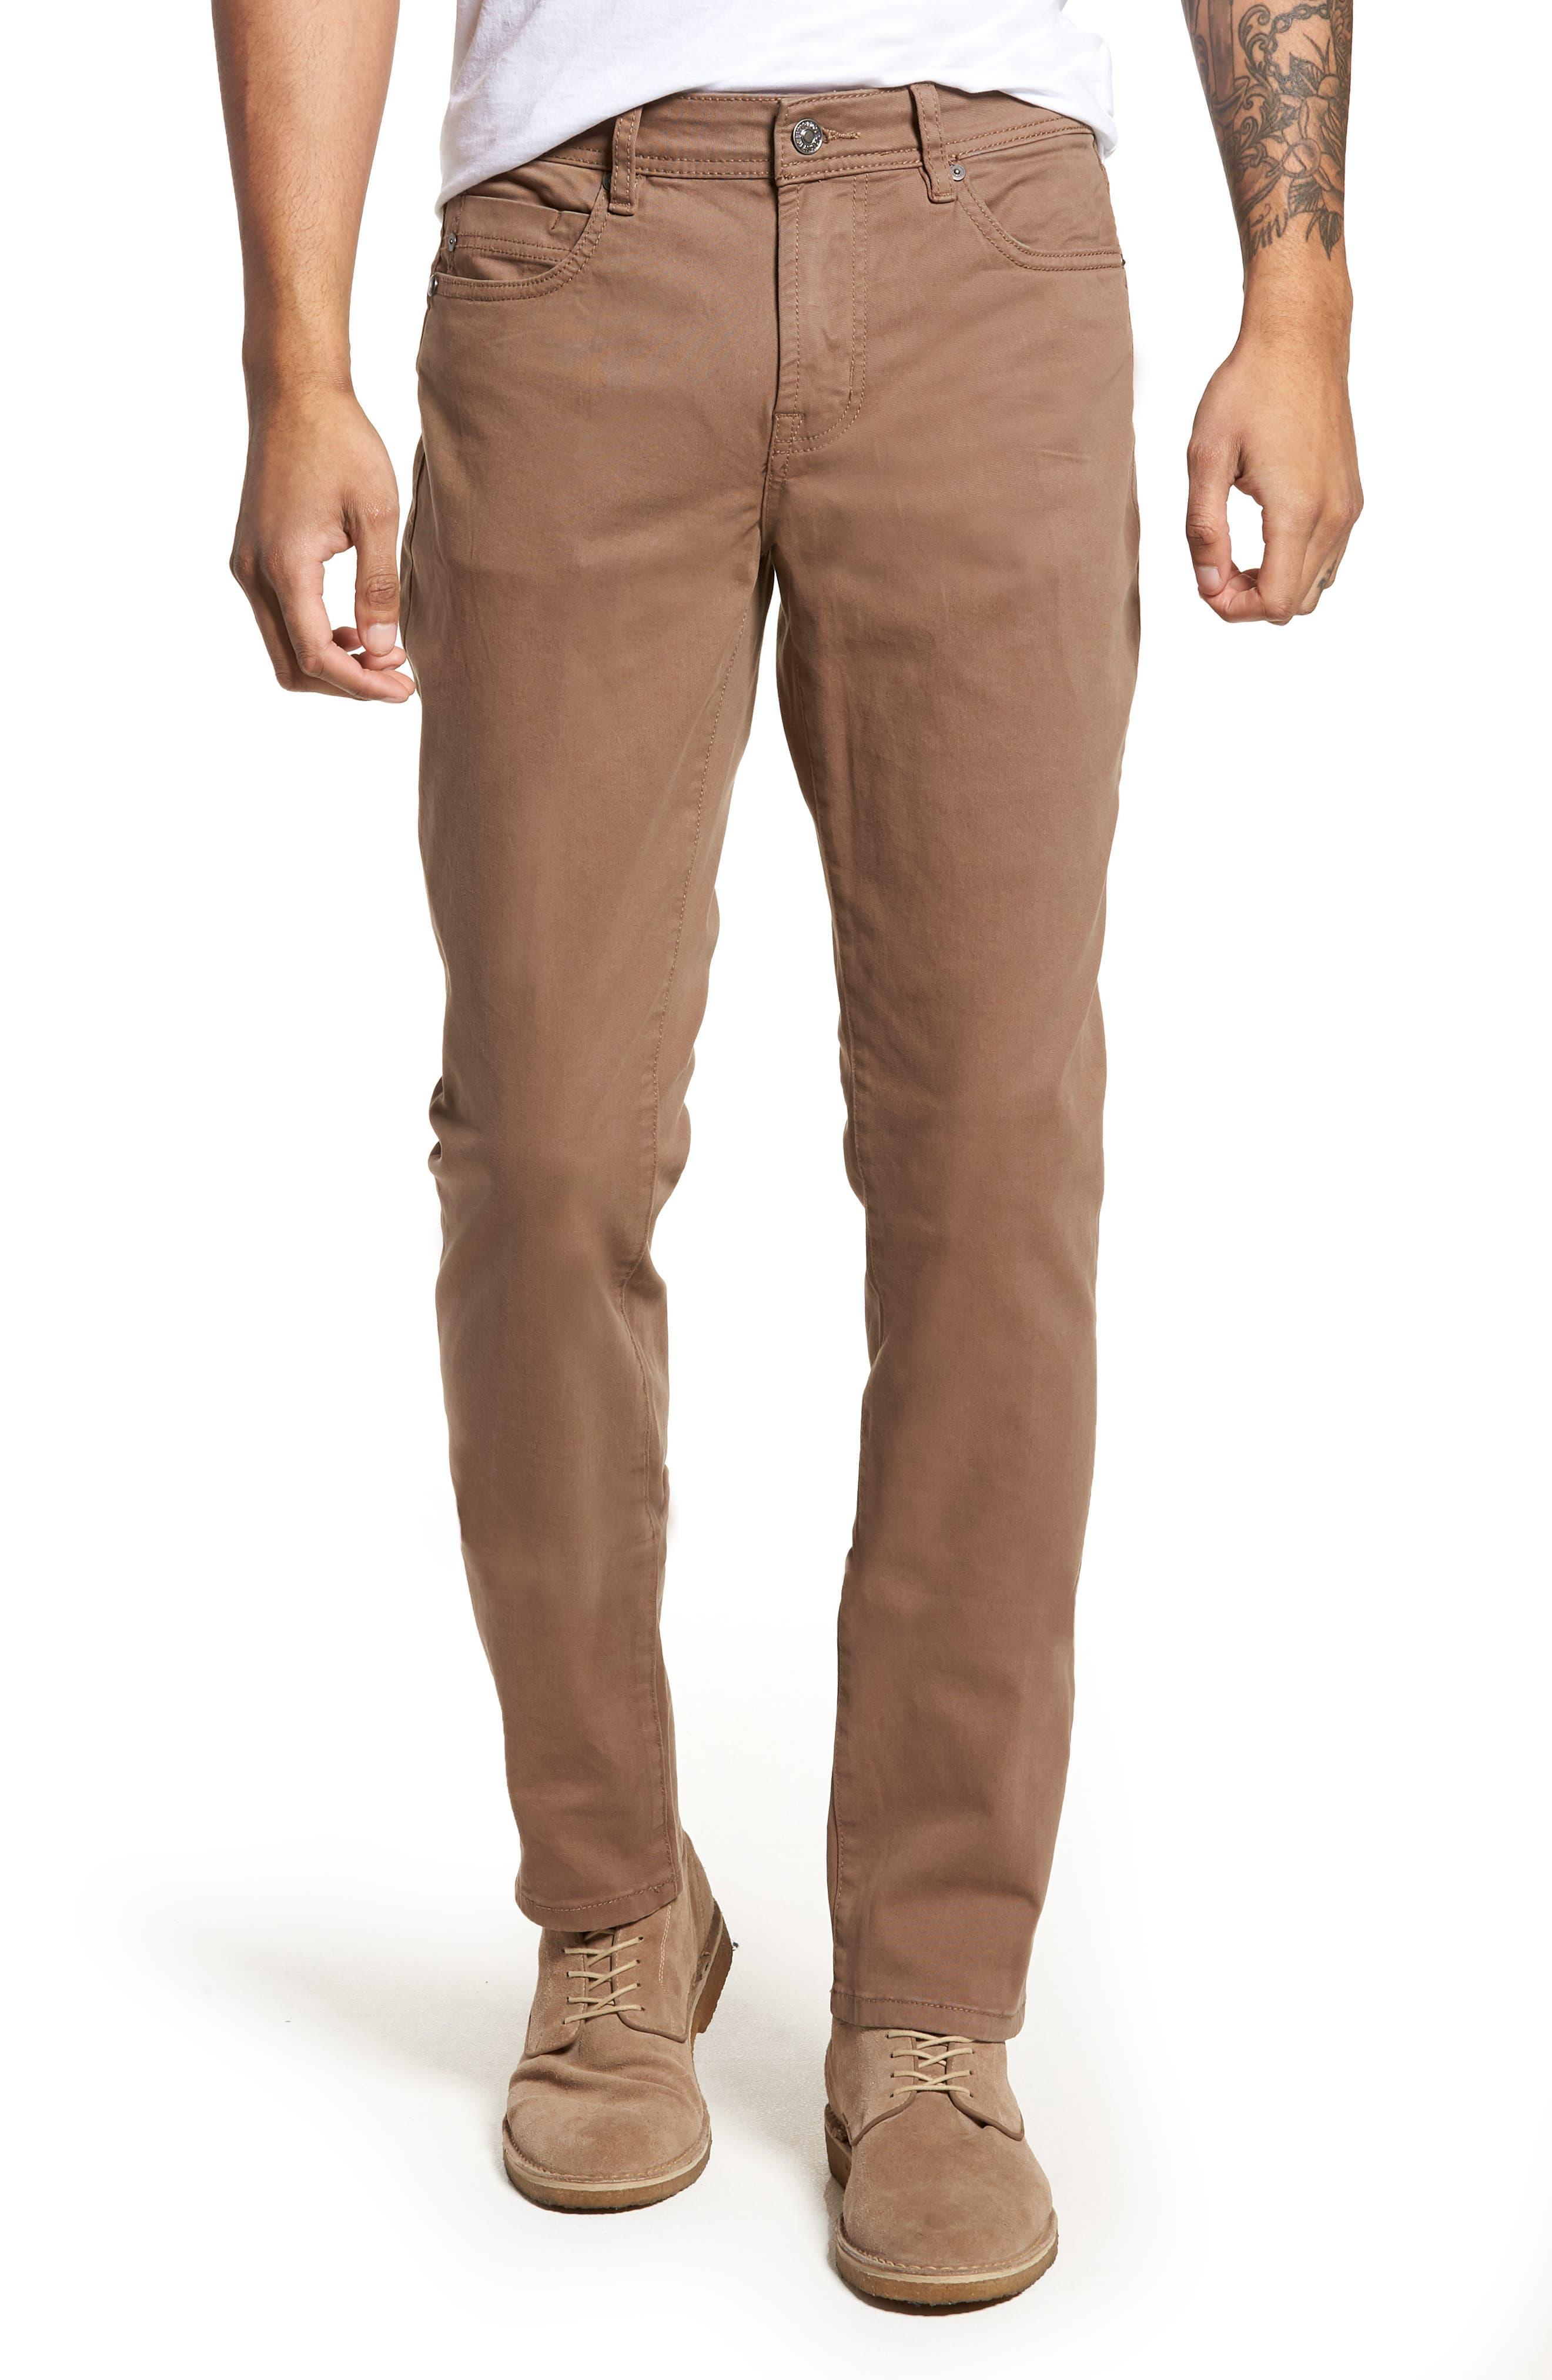 Jeans Co. Kingston Slim Straight Leg Jeans,                         Main,                         color, CUB